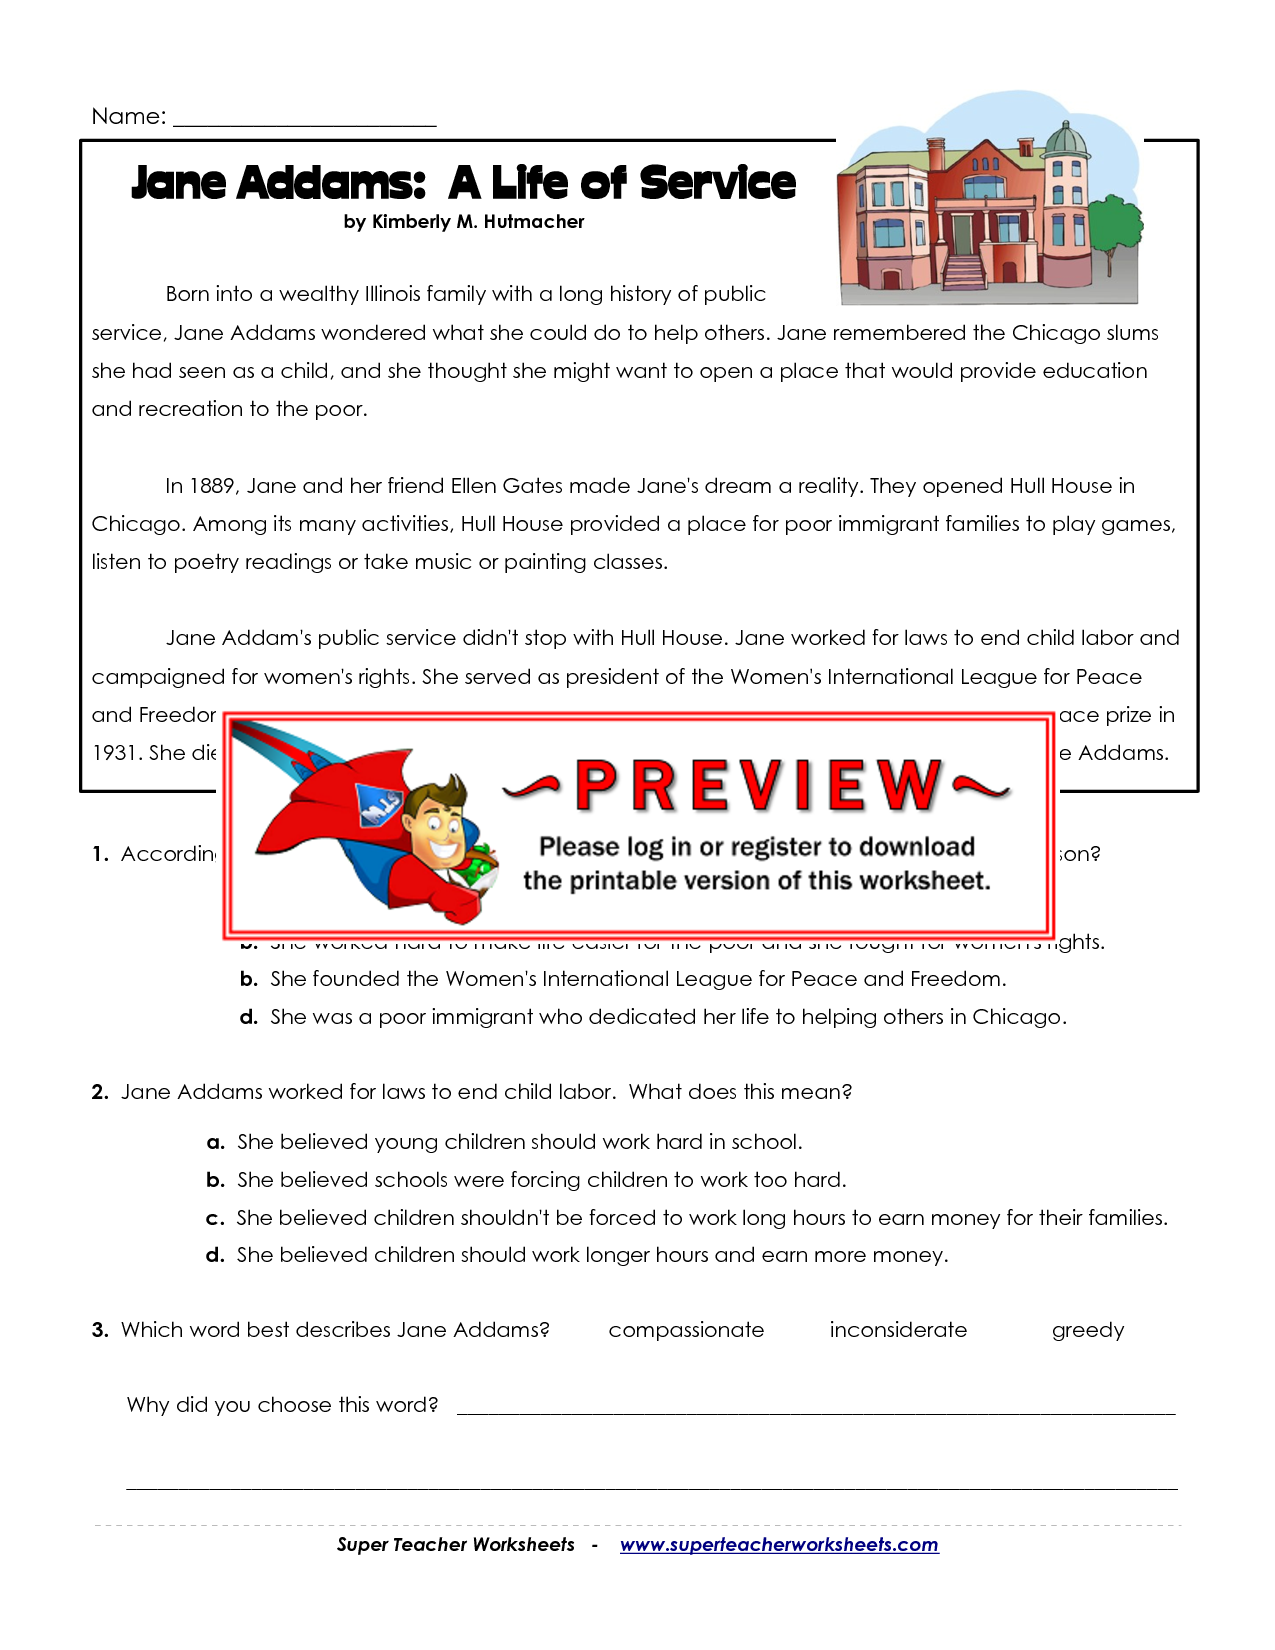 Jane Addams A Life of Service - Super Teacher Worksheets | Illinois ...